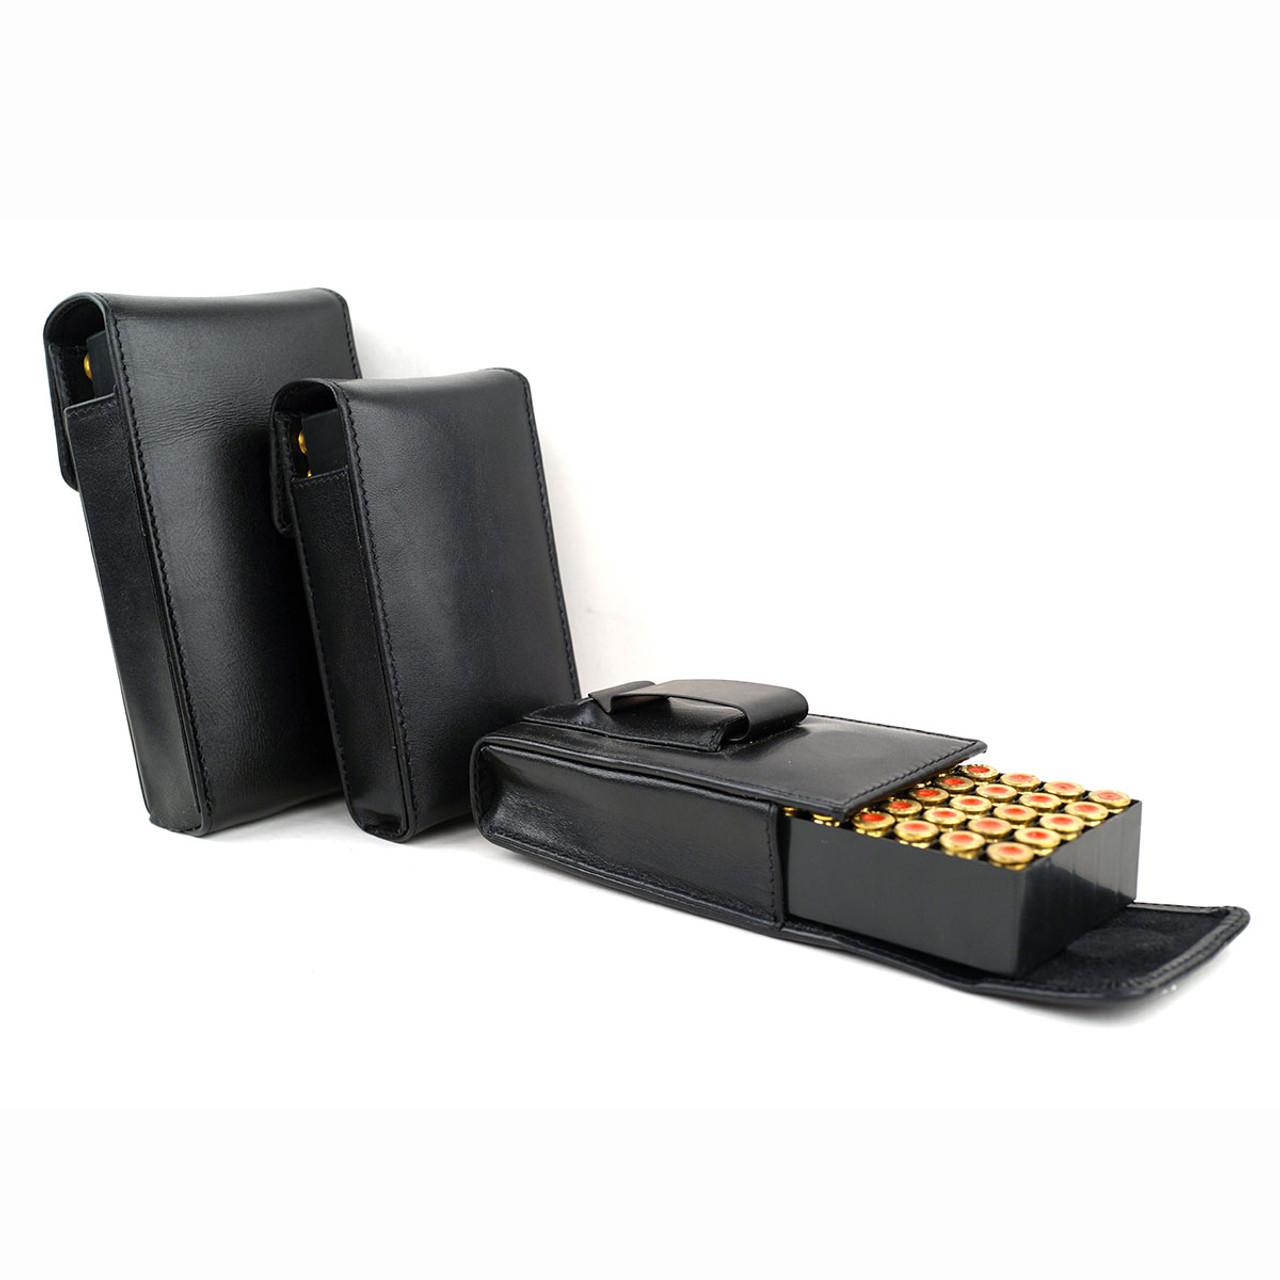 S&W BodyGuard 380 Leather Arsenal 50 Round Belt Case